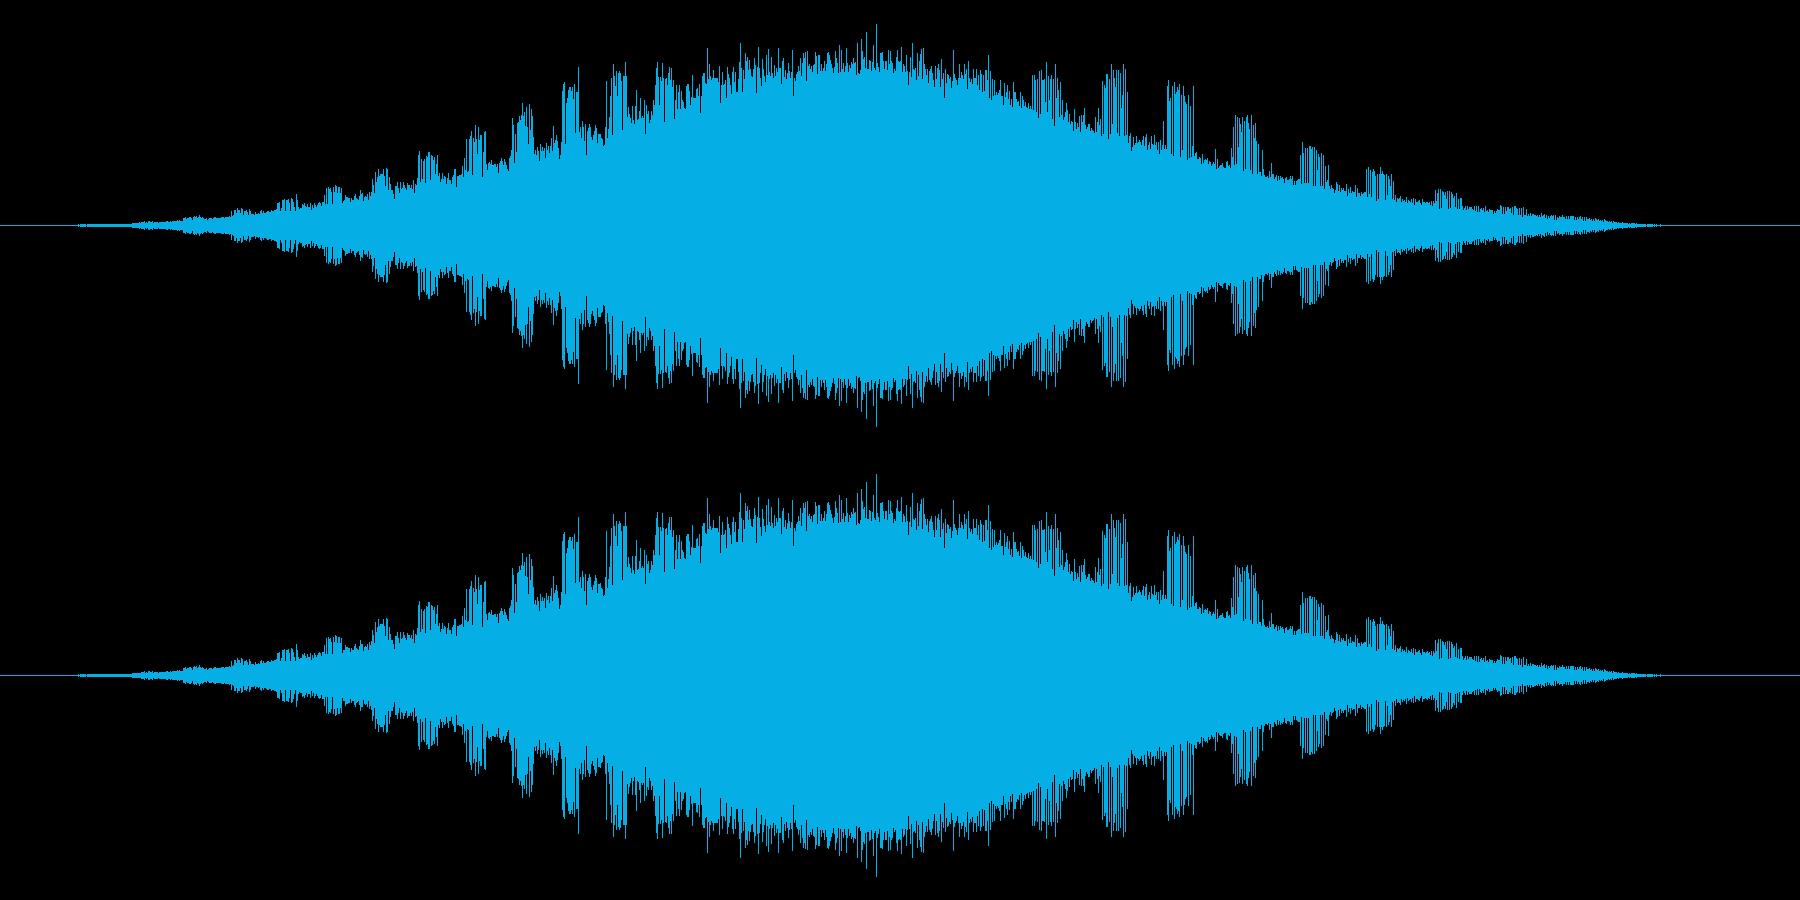 GB レースゲーム01-01(通過) の再生済みの波形